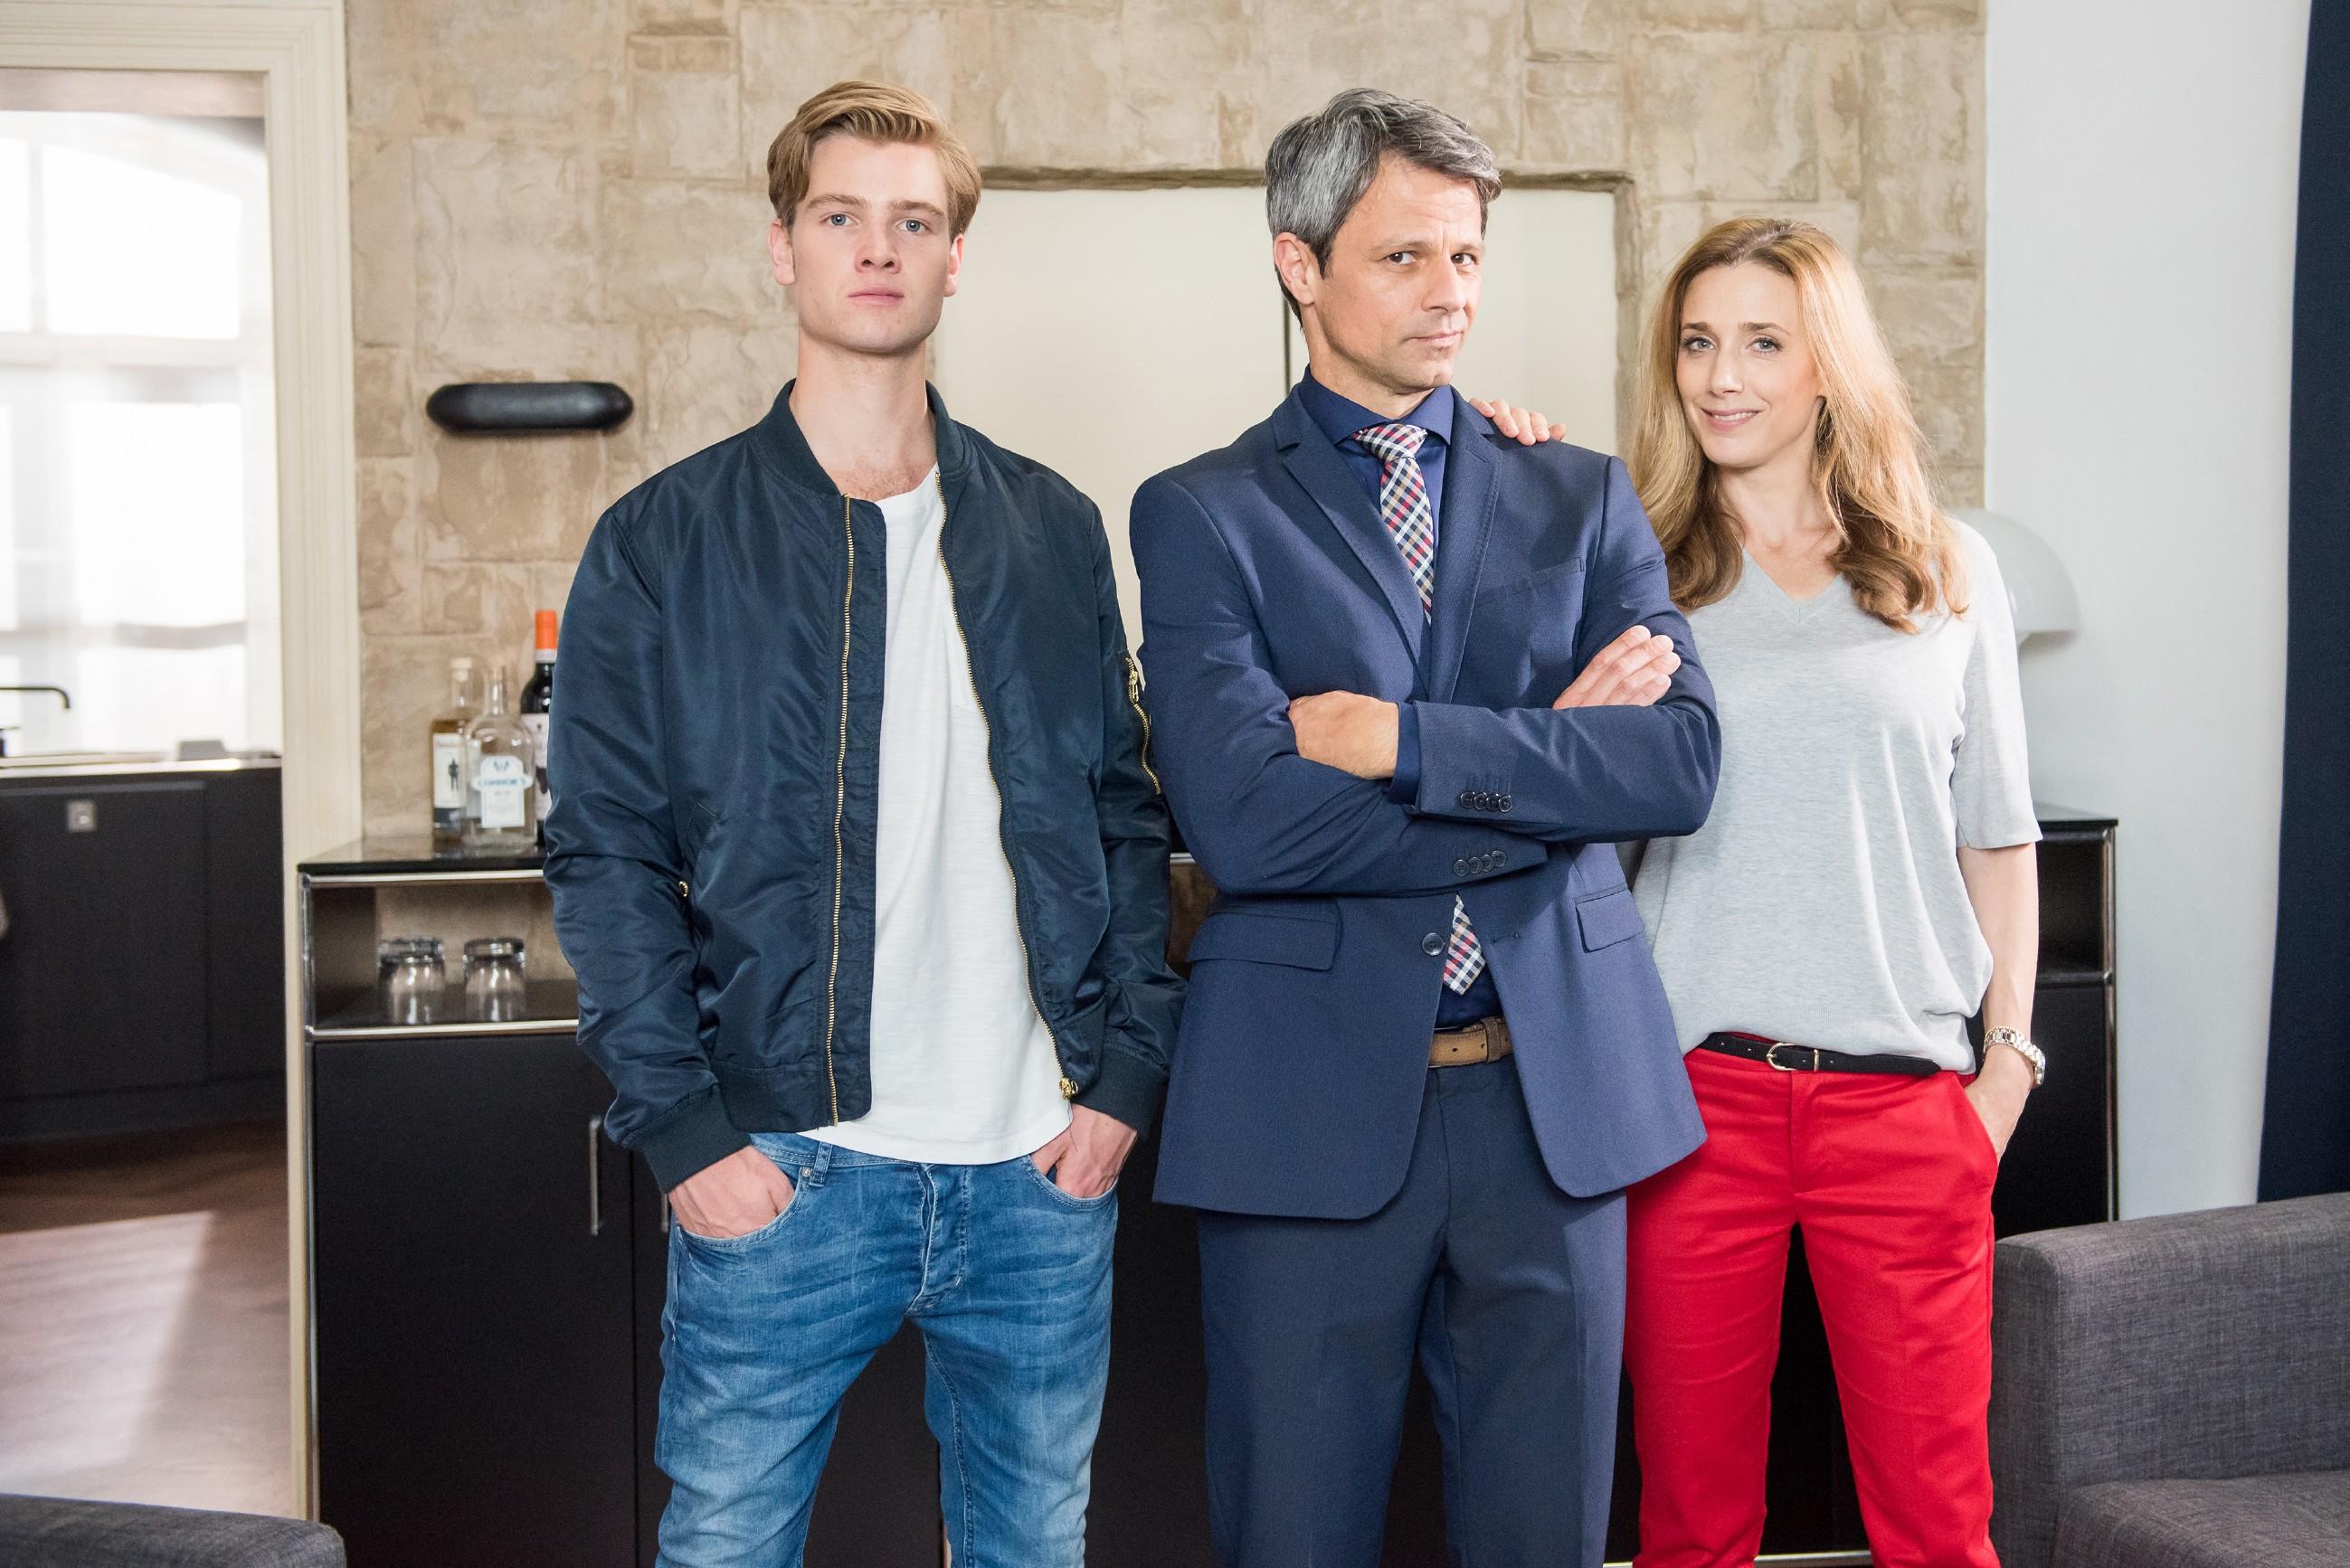 Familie Huber: Benedikt Huber (Jens Hajek, M.), seine Frau Andrea (Kristin Meyer) und Sohn Valentin (Aaron Koszuta)